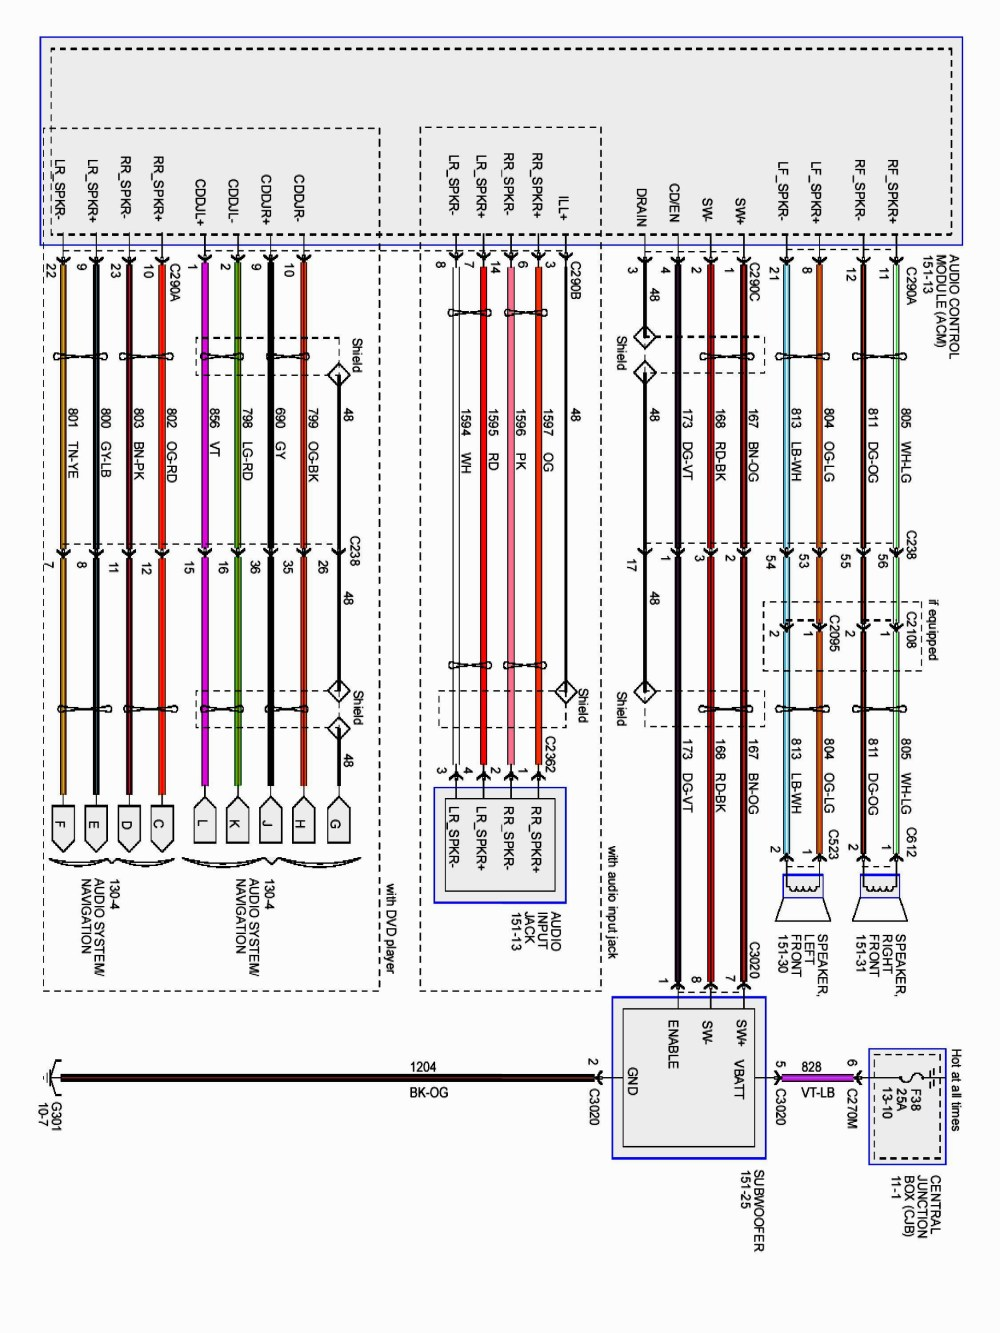 medium resolution of ford econoline radio wiring diagram collection wiring diagram 2001 ford e350 radio f250 for f150